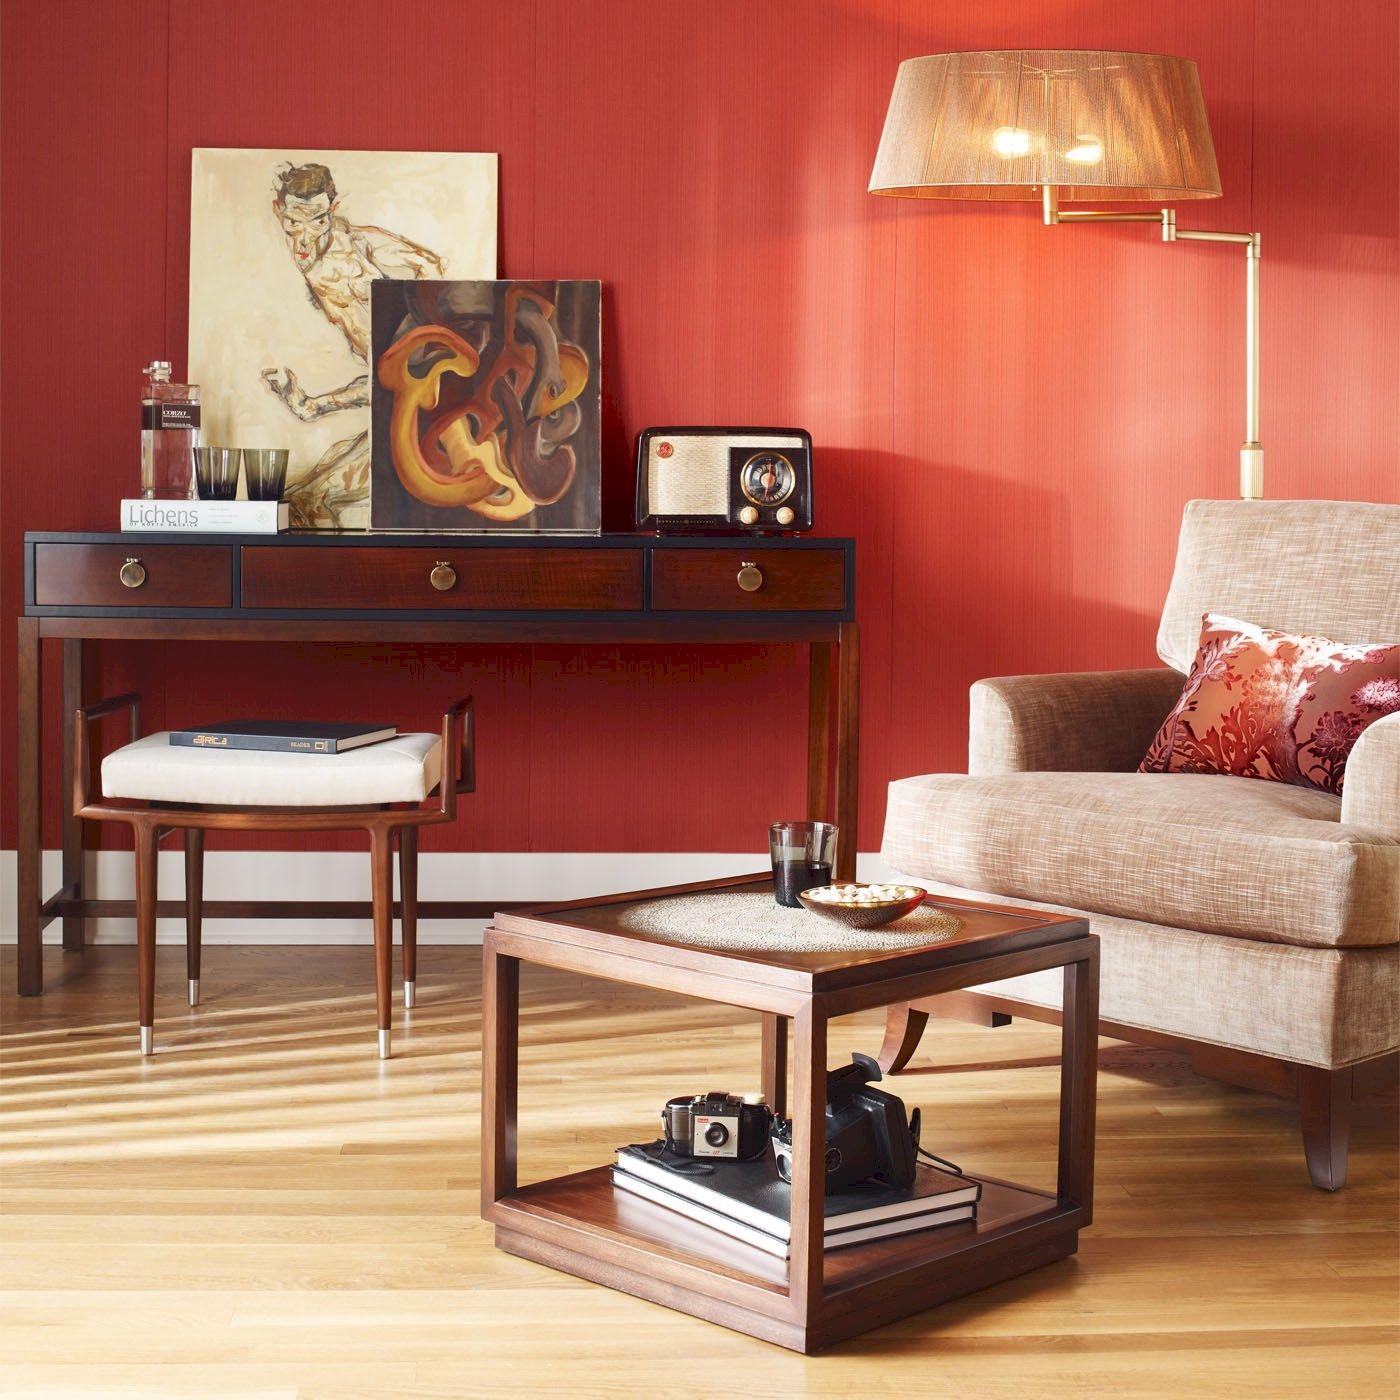 The Lexicon Collection Baker Furniture Suite 60 Michigan Design  # Muebles Pullman